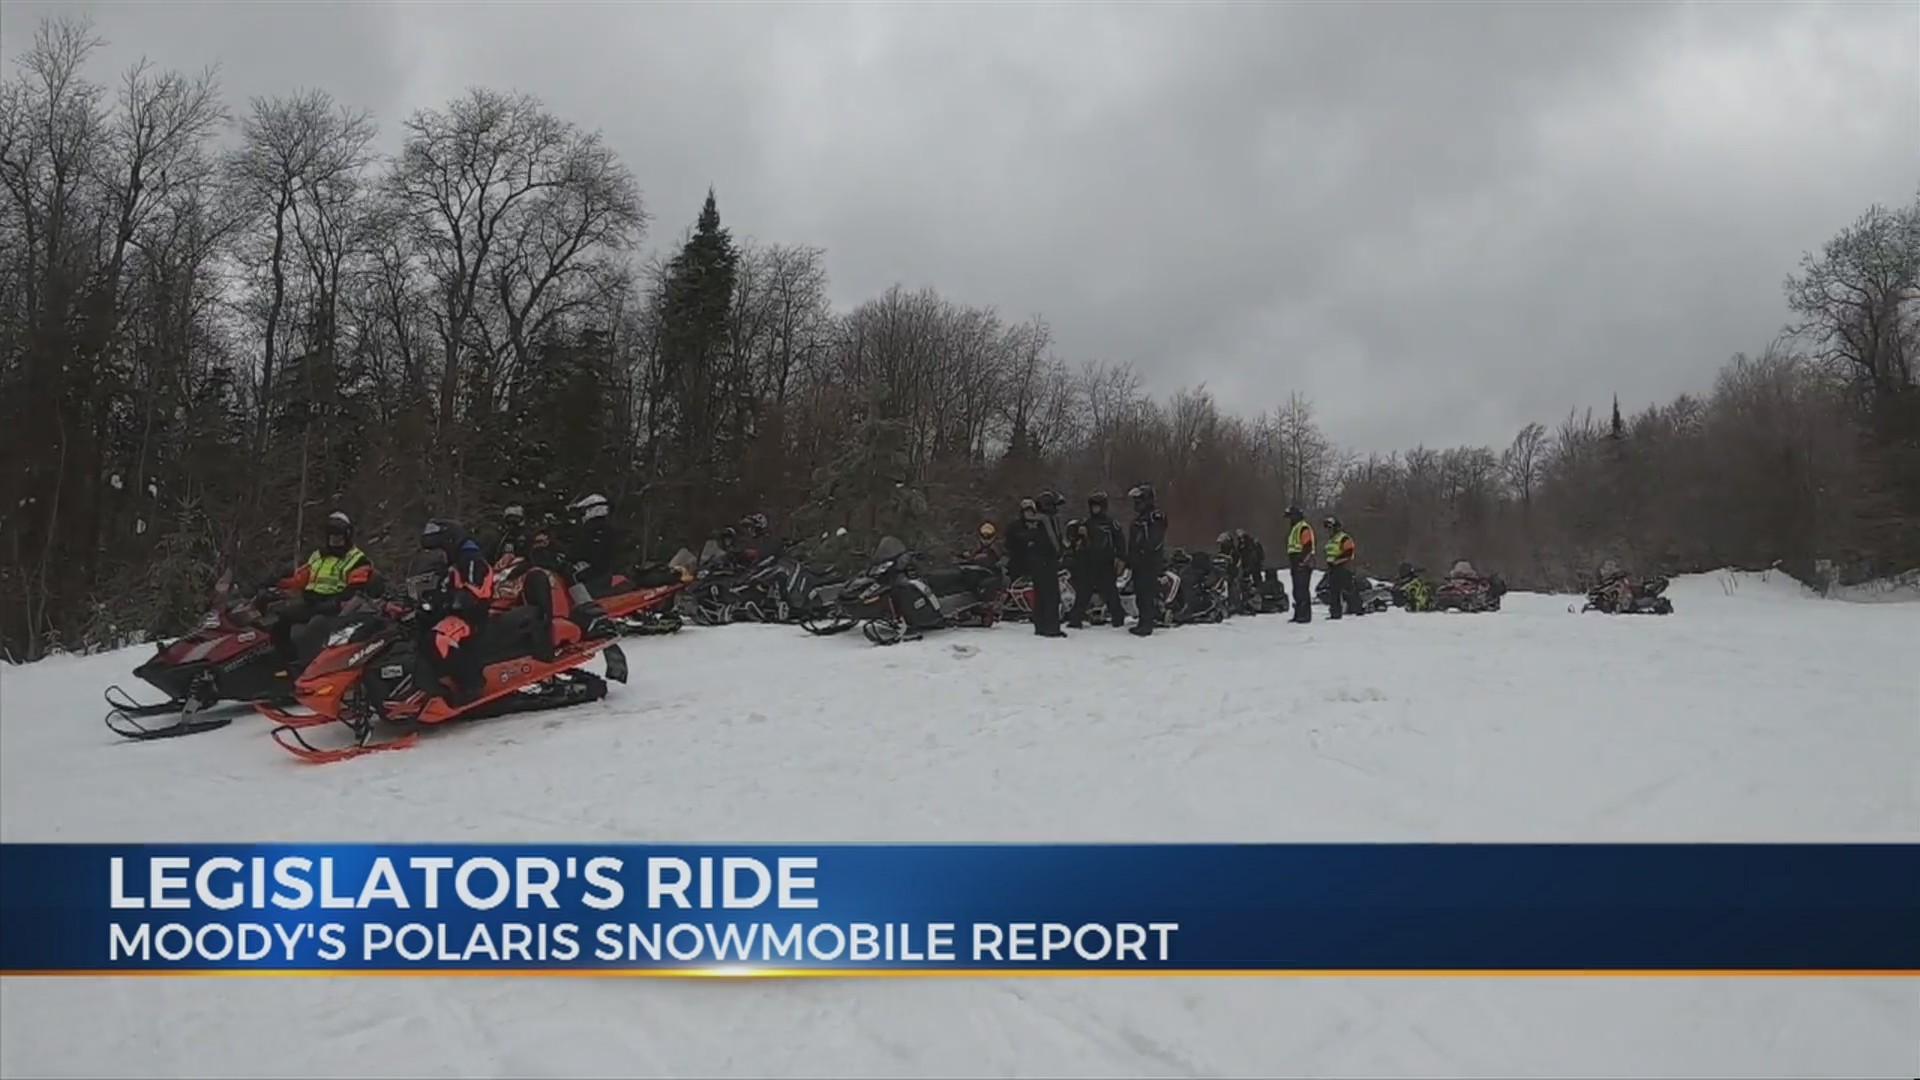 Moody's Polaris Snowmobile Report 2-21